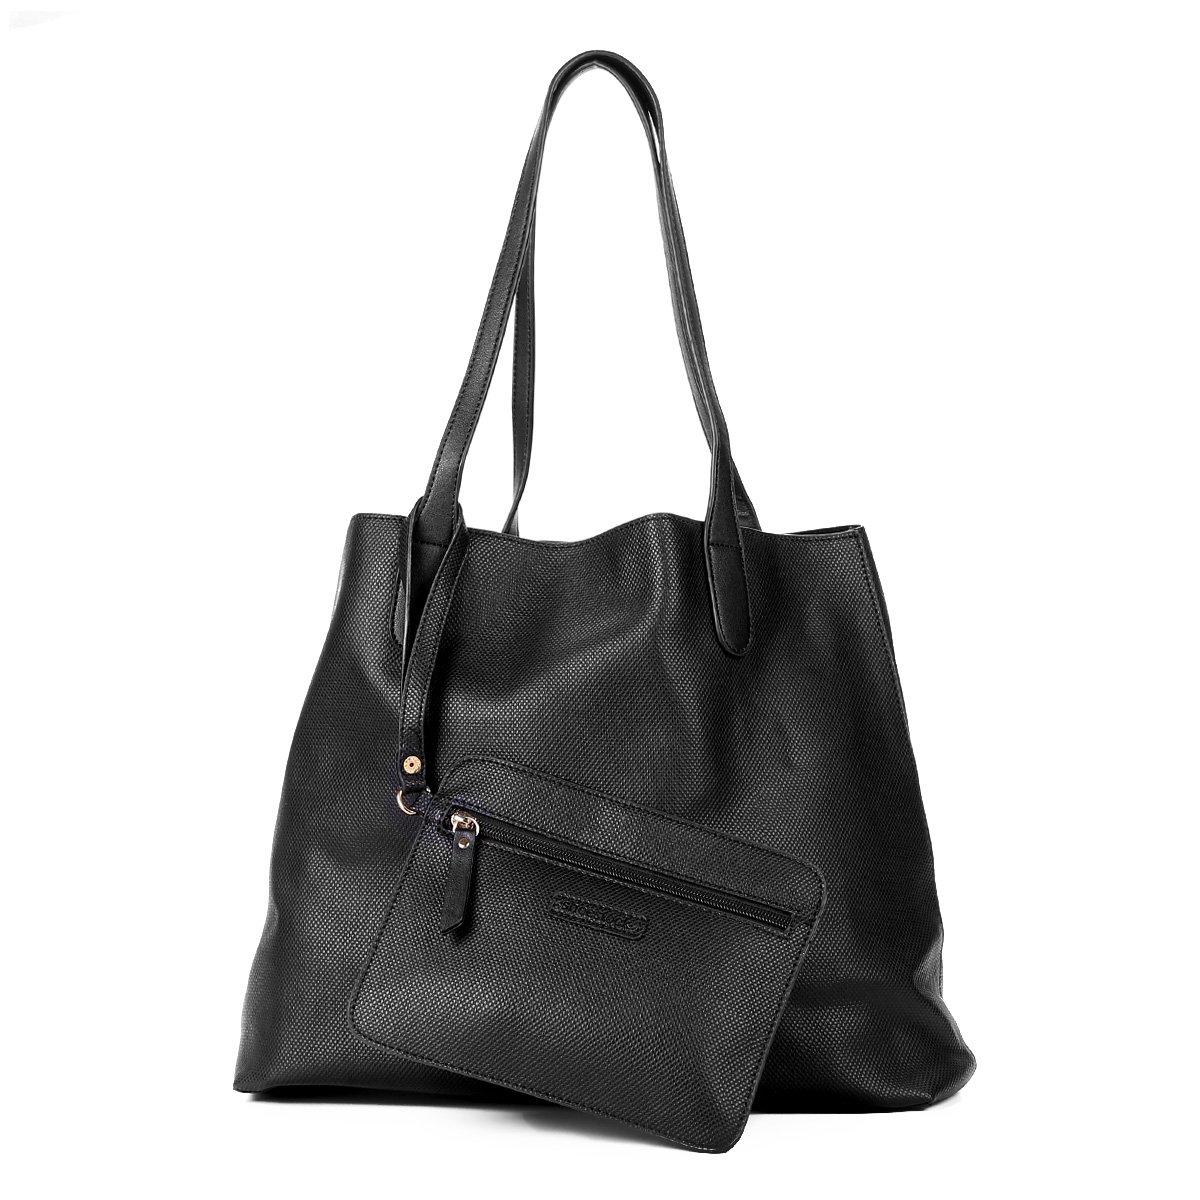 74358e9c4 Bolsa Shoestock Shopper Textura Feminina - Preto - Compre Agora ...